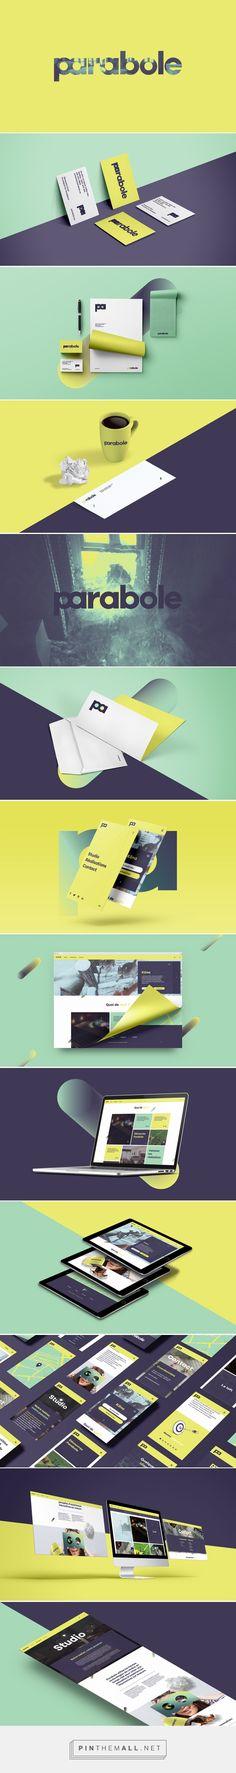 Parabole Branding by 32Mars | Fivestar Branding – Design and Branding Agency & Inspiration Gallery - created via https://pinthemall.net